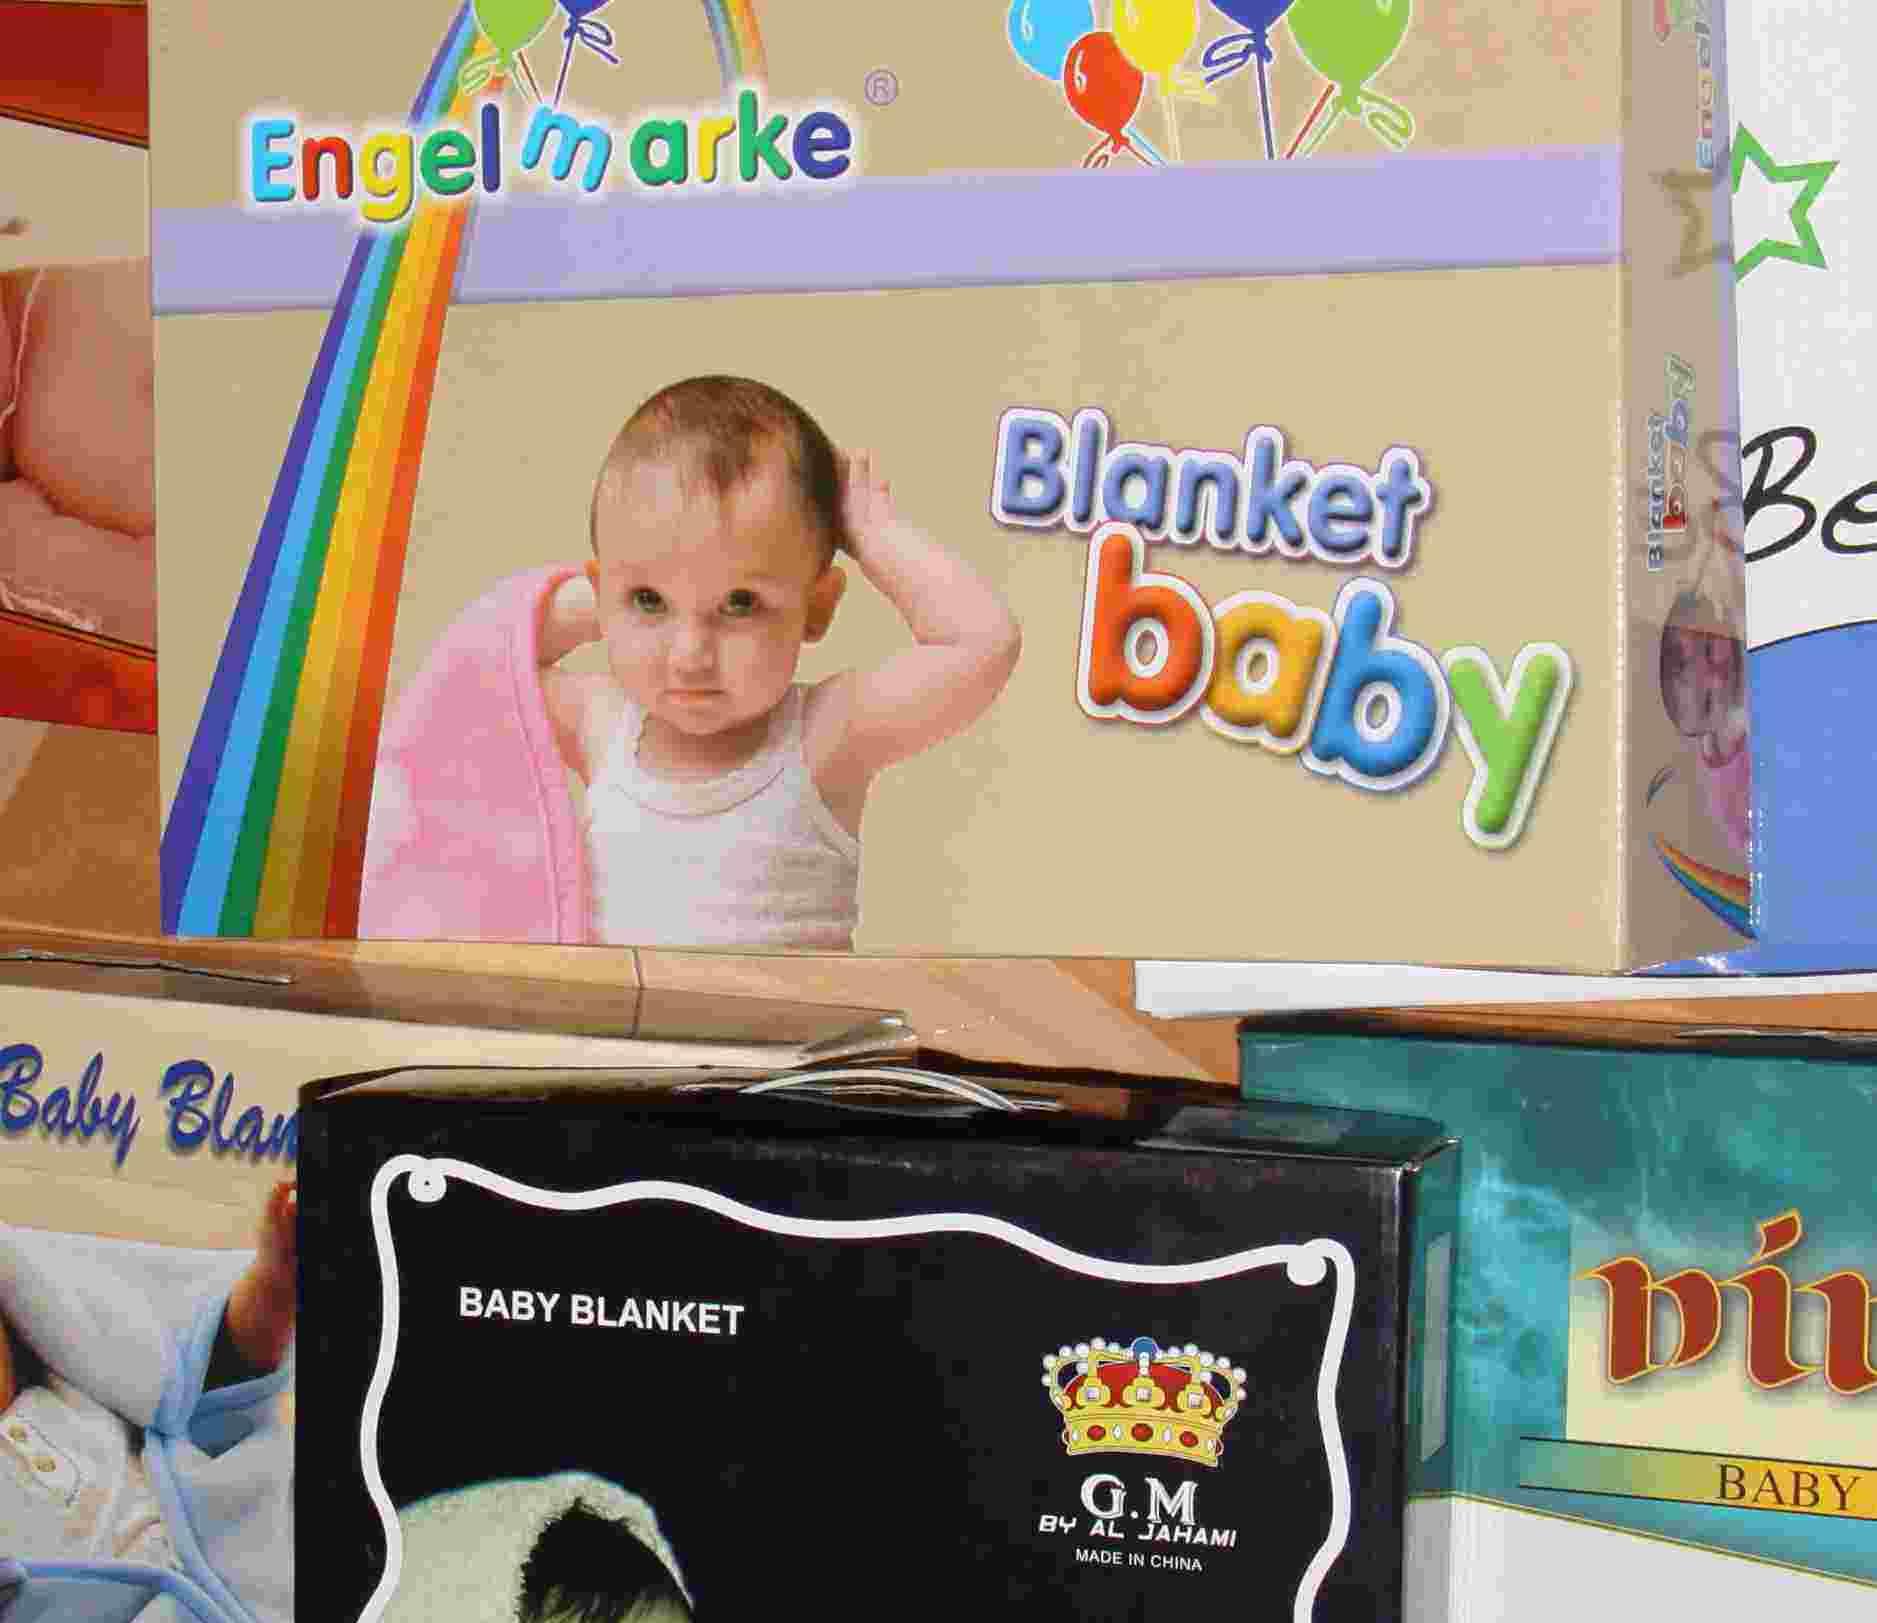 Baby Blanket Gift Box : China baby blanket gift paper box